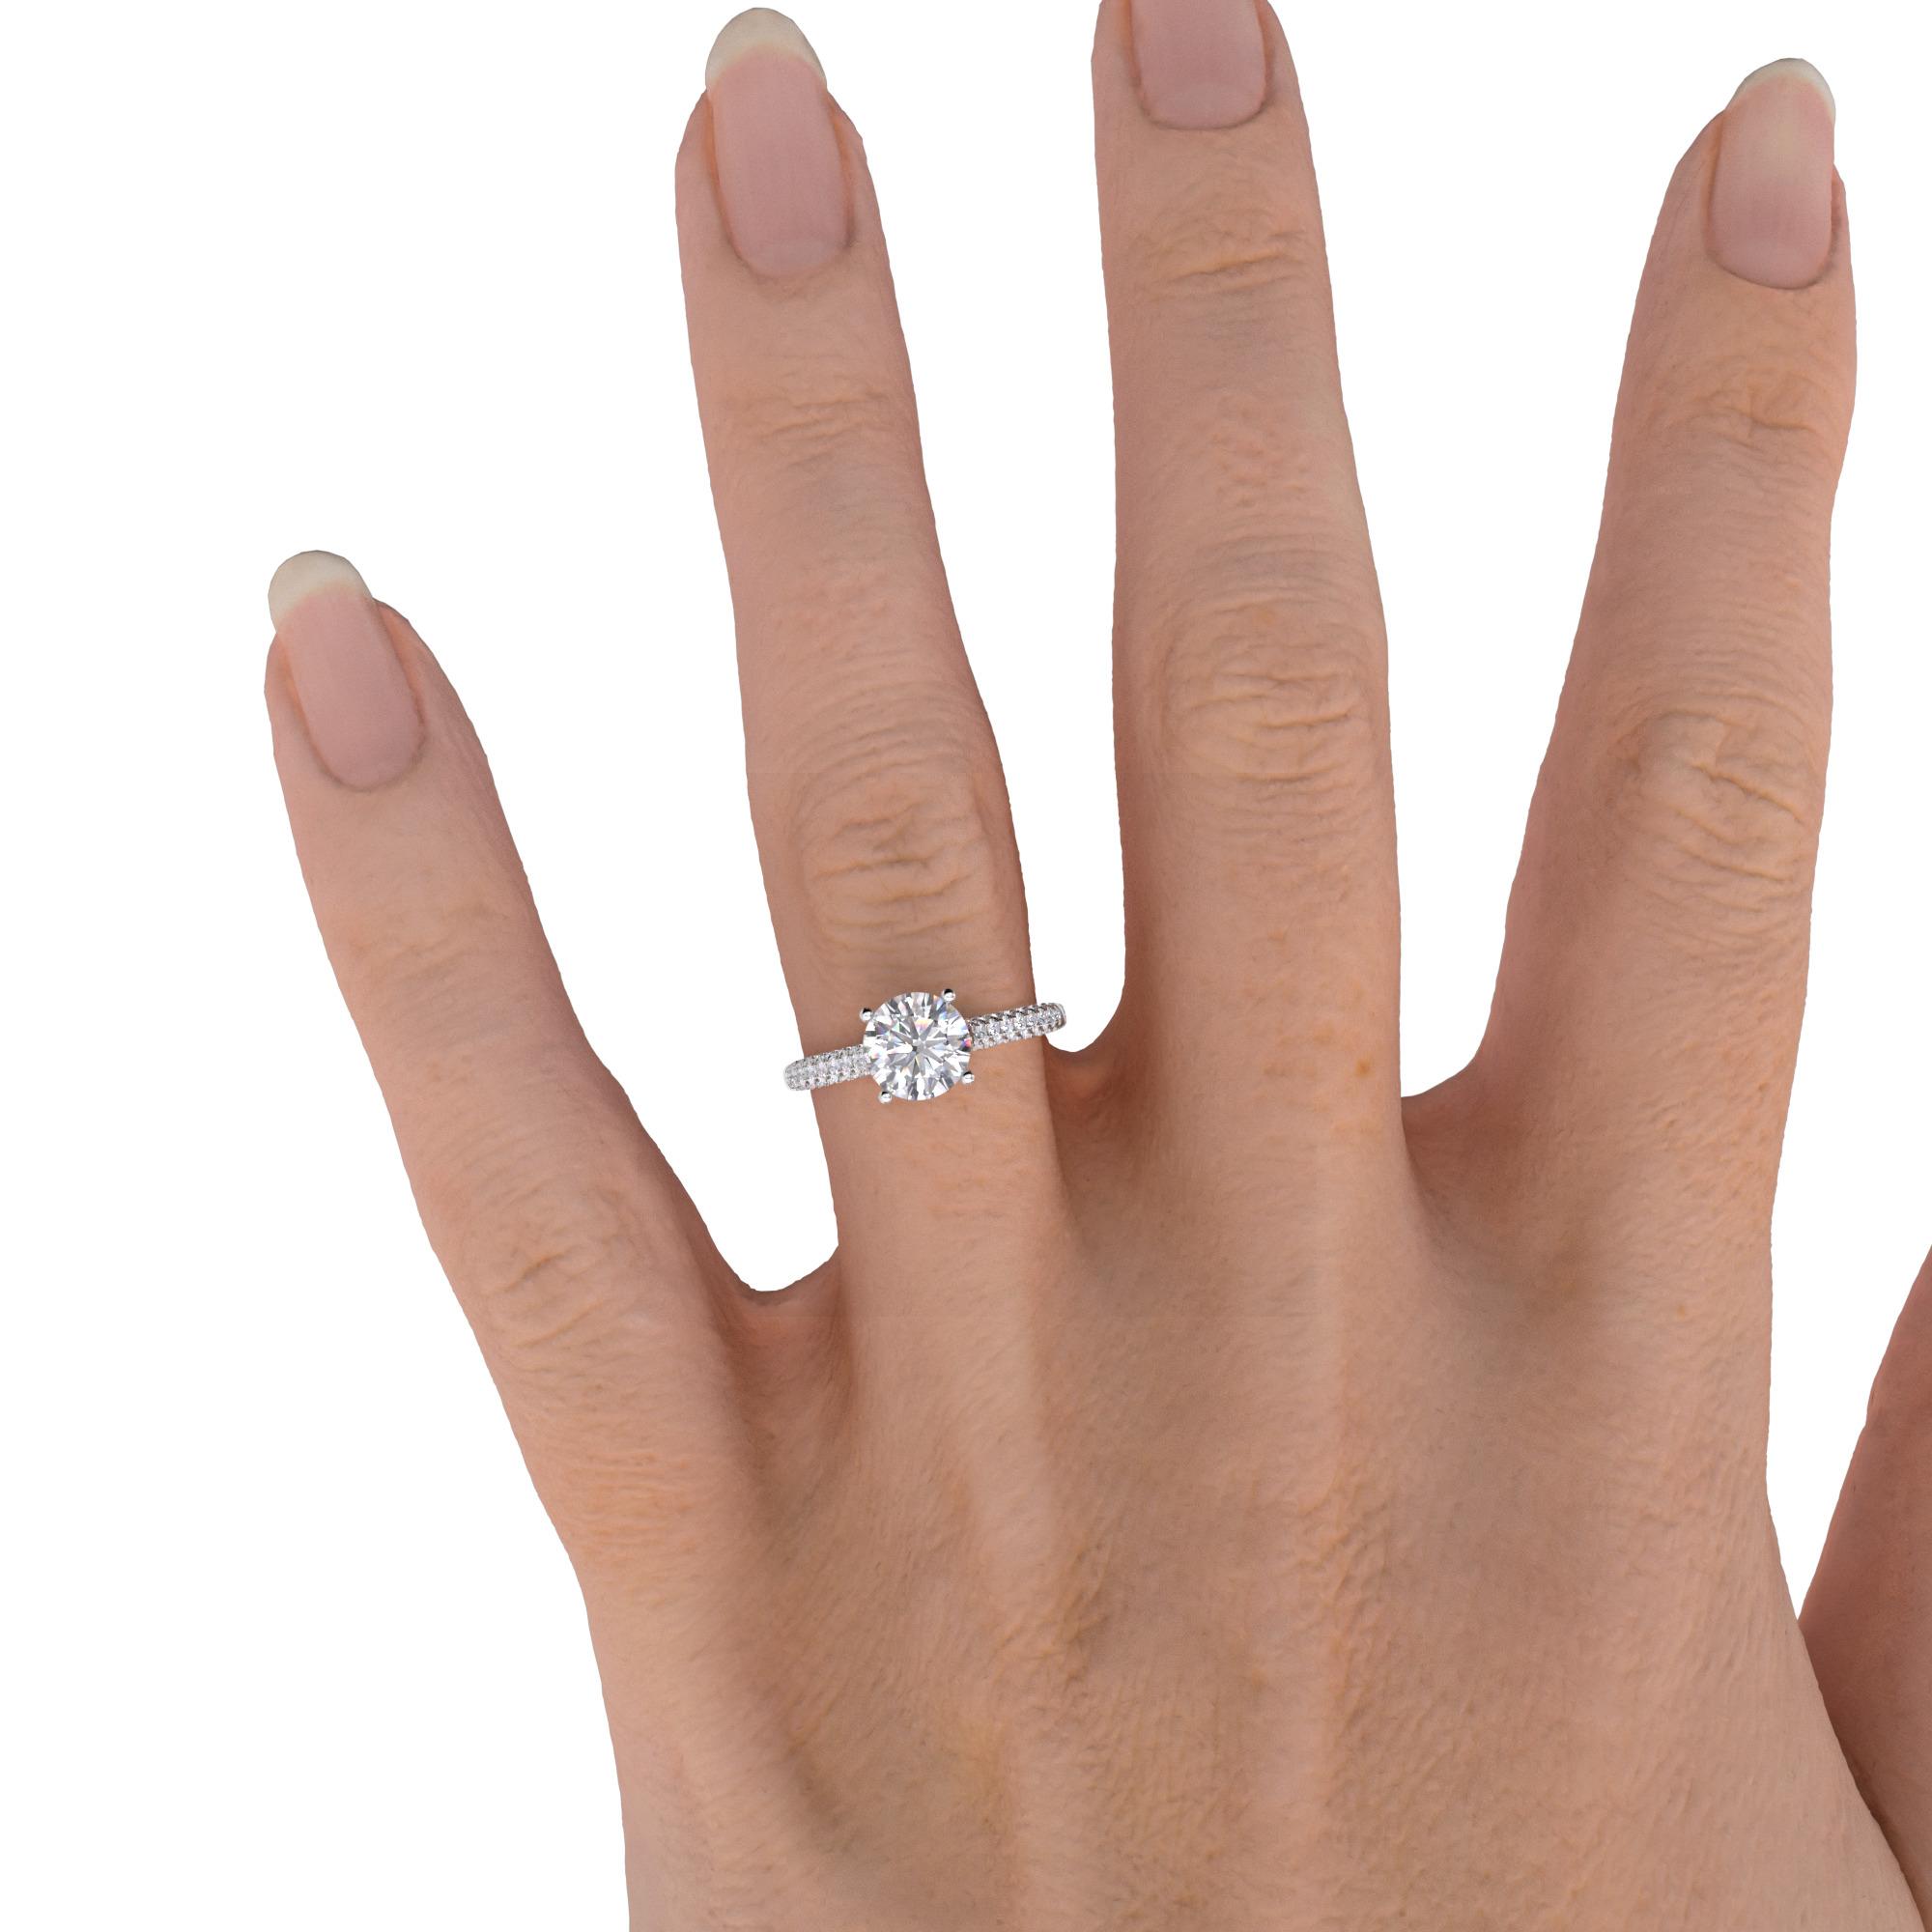 Inel de Logodna Solitaire cu Diamante Mici pe Lateral Dama Platina cu Diamant Central Rotund Brilliant si Diamante Mici pe Lateral, Setare Gheare-img1